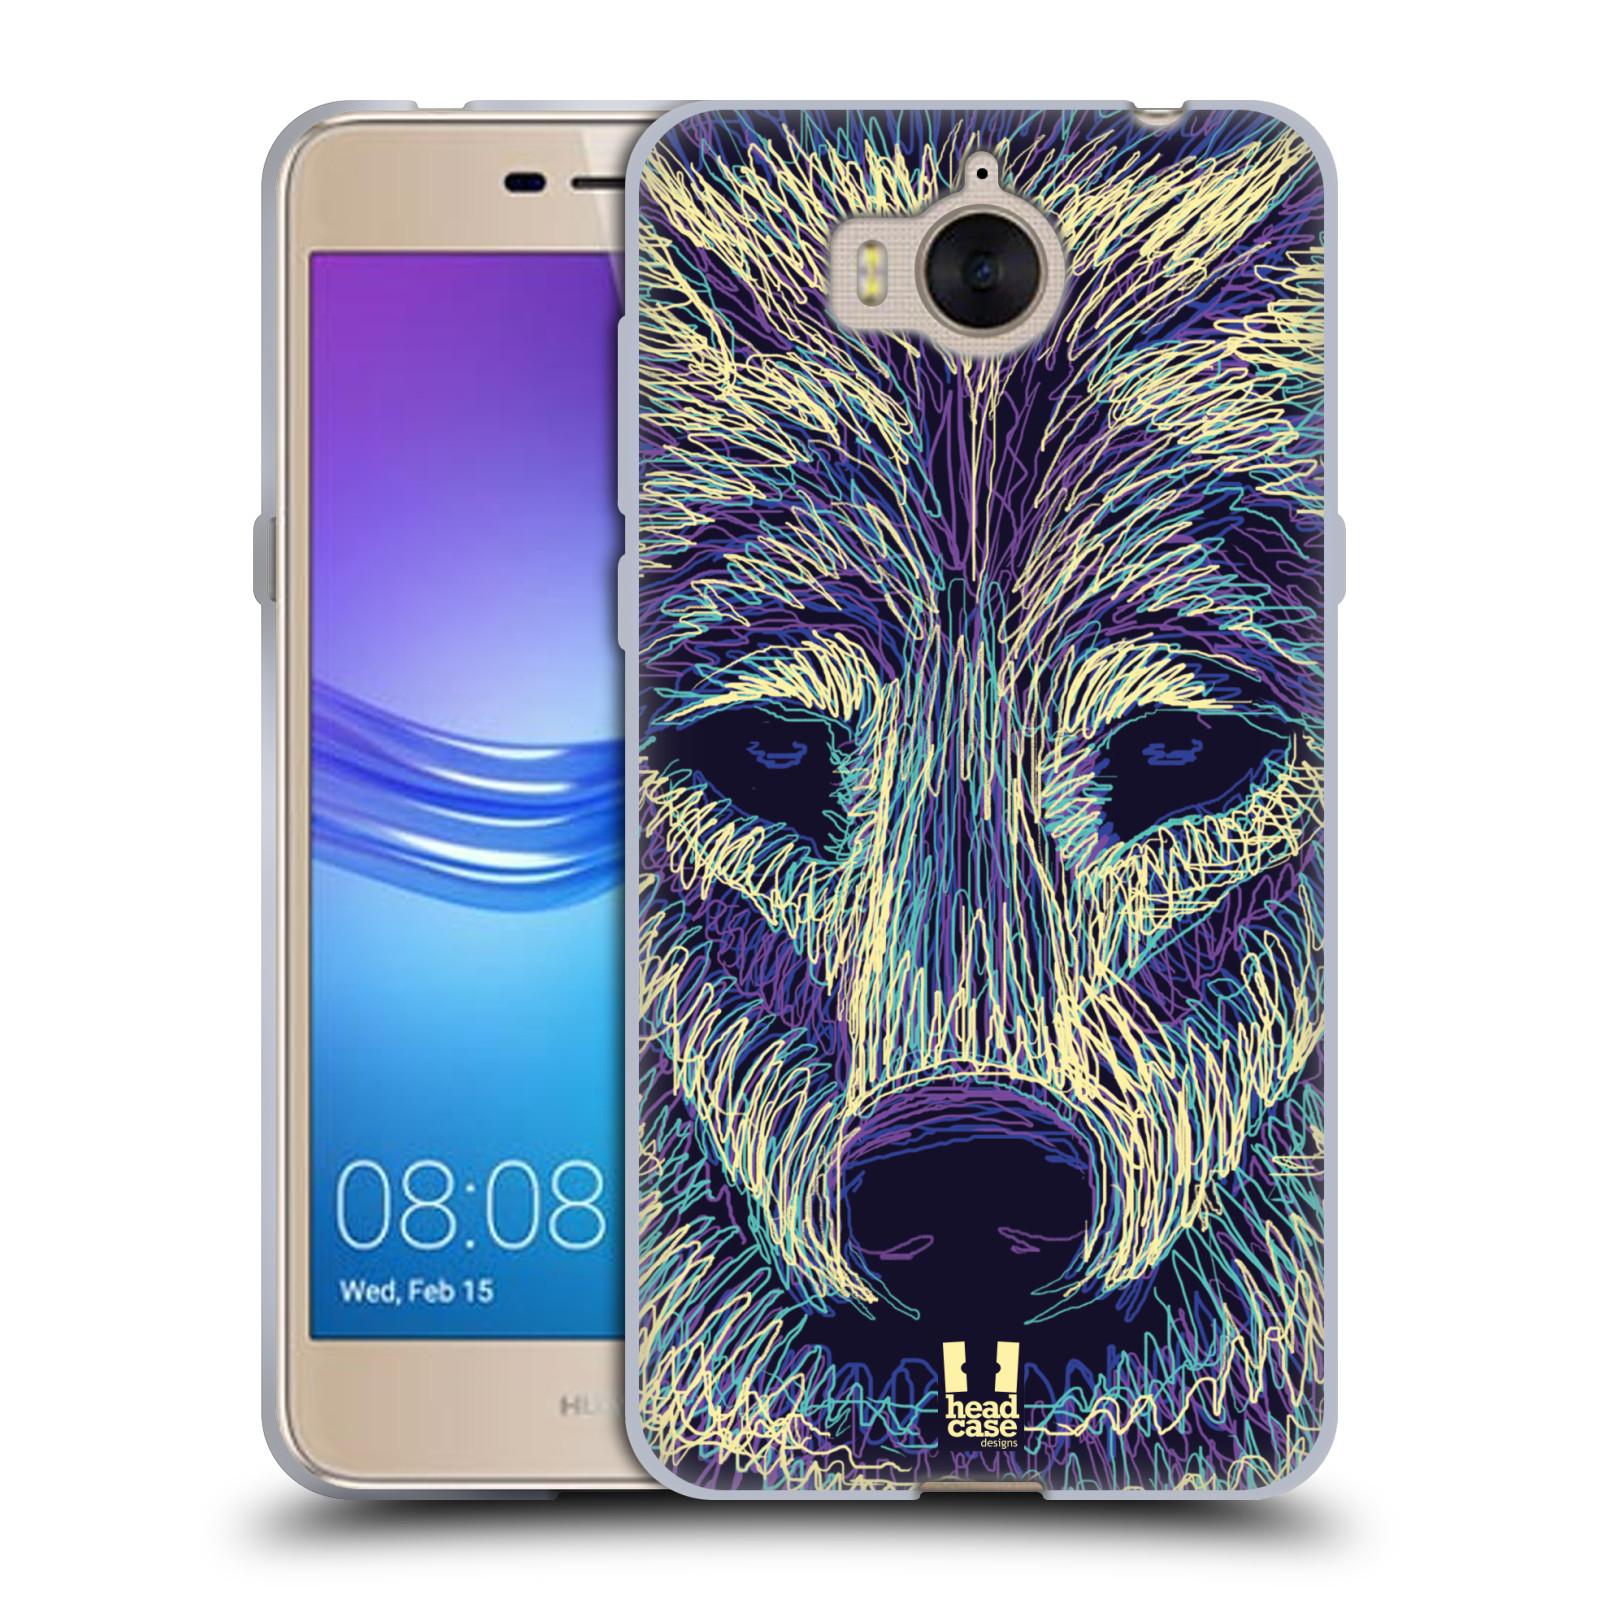 Silikonové pouzdro na mobil Huawei Y6 2017 - Head Case - SCRIBBLE VLK (Silikonový kryt či obal na mobilní telefon Huawei Y6 (2017) s motivem SCRIBBLE VLK)